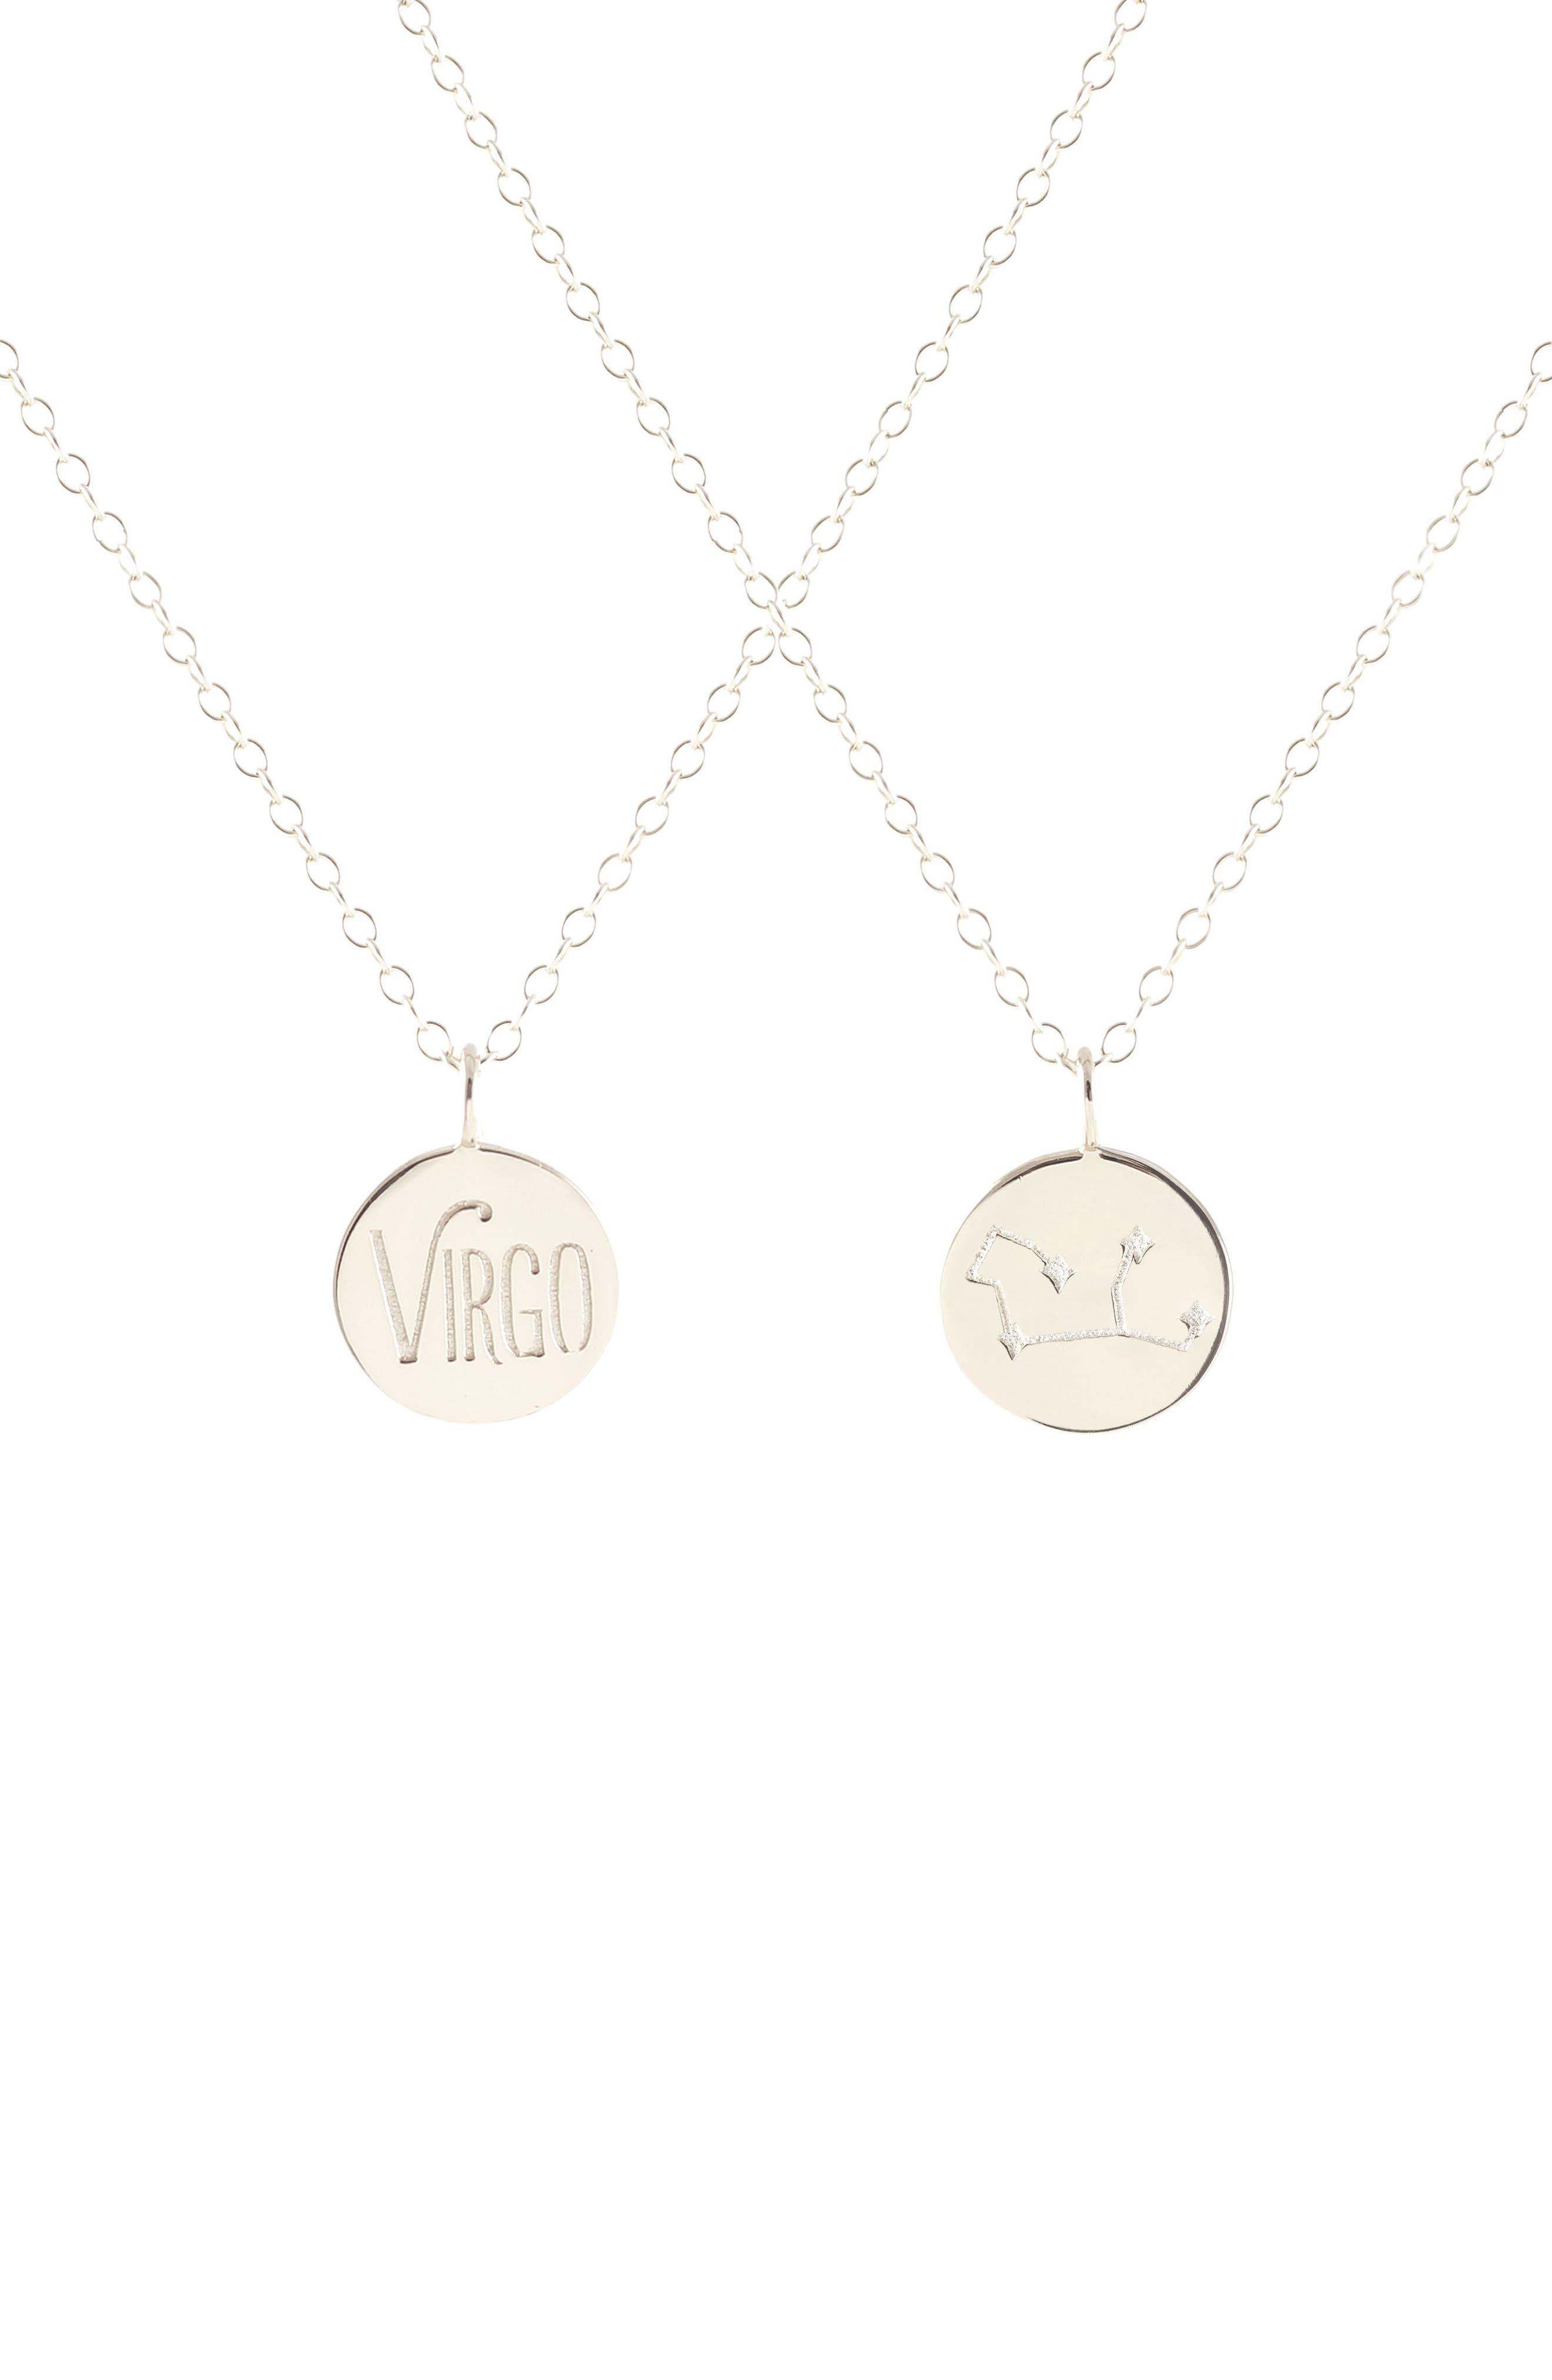 Zodiac Charm Necklace,                         Main,                         color, Virgo - Silver